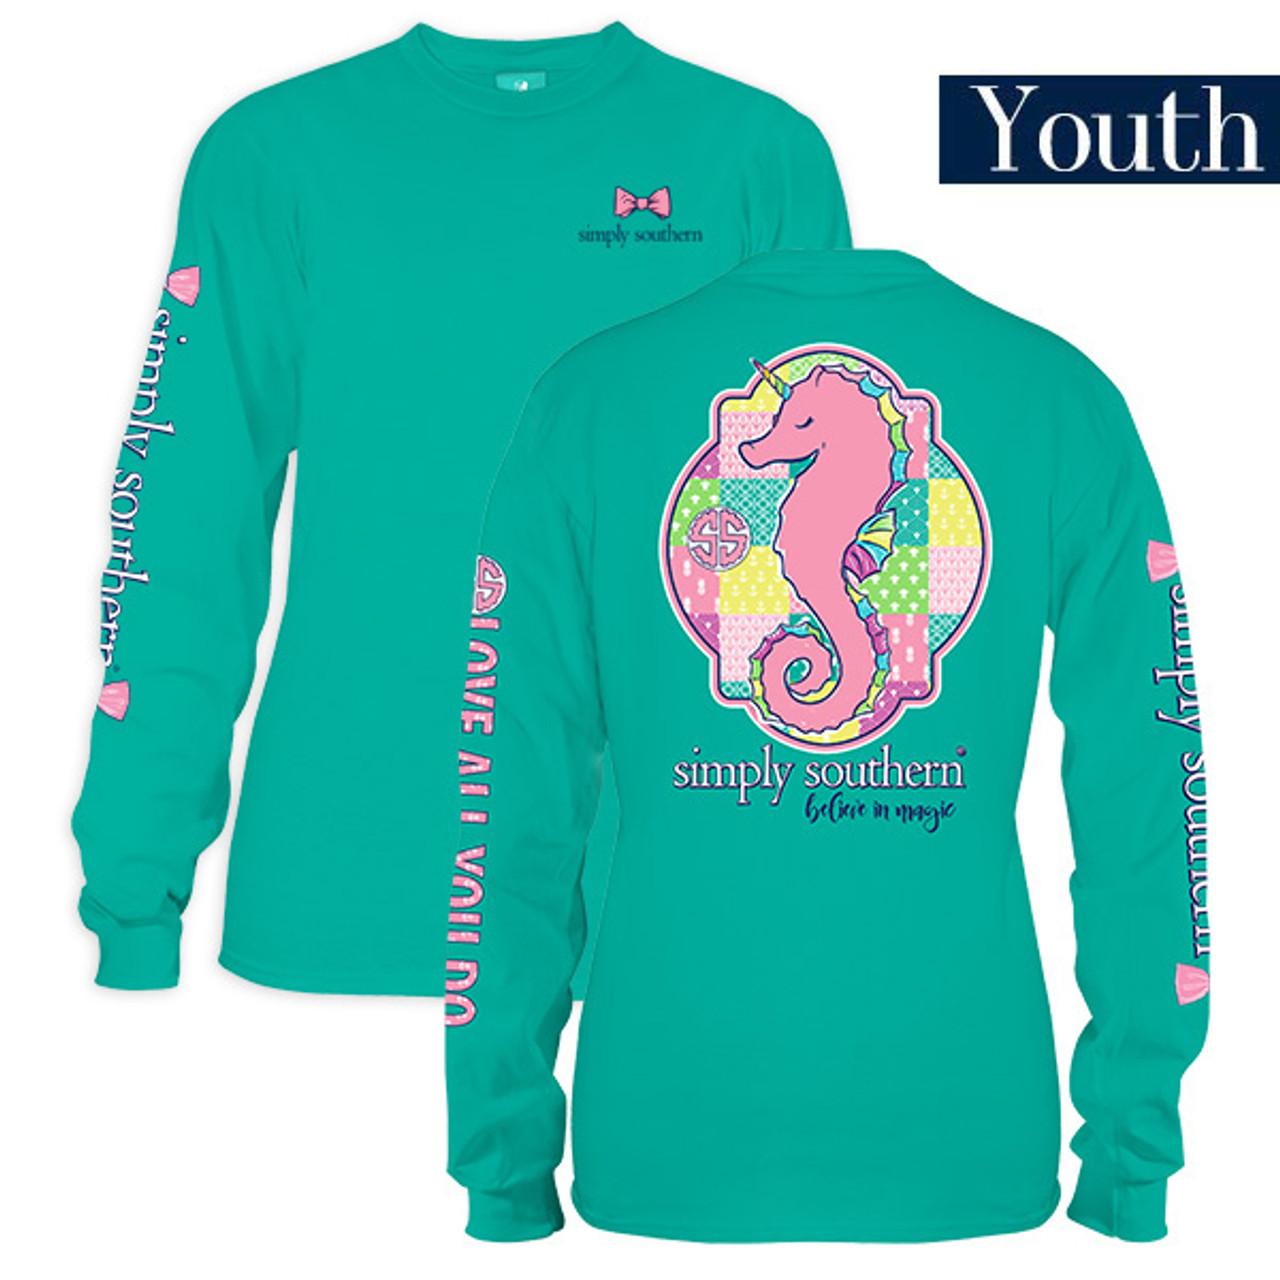 4cf1b5e4a8b7 Youth Sea Unicorn Seahorse Long Sleeve Simply Southern Tee Shirt ...